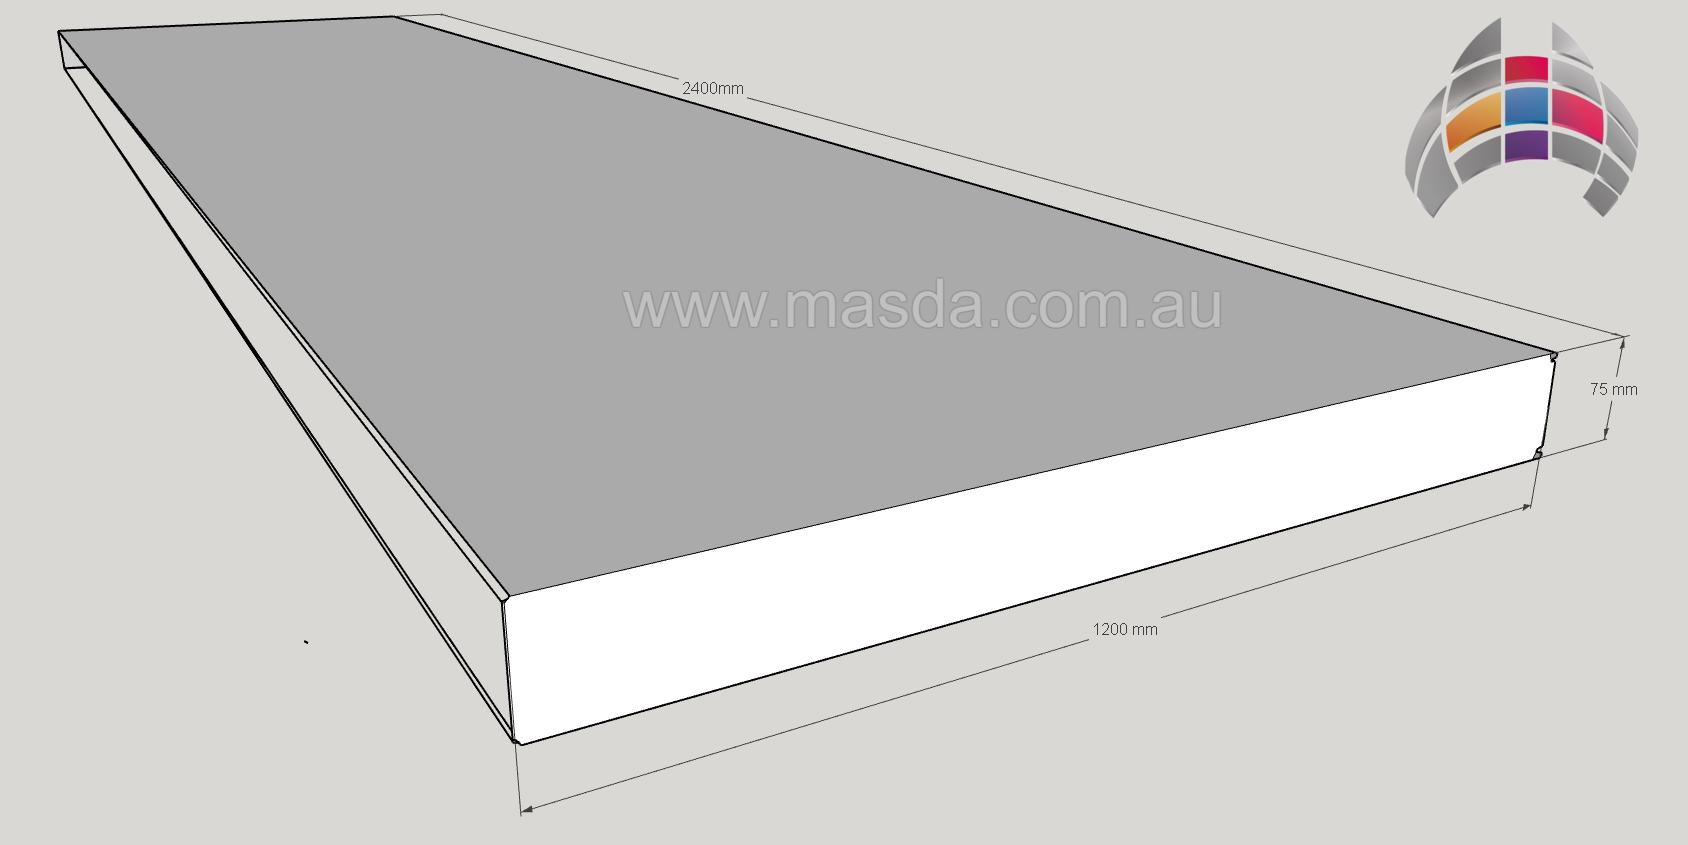 Masda Wall Panel 75mm 2